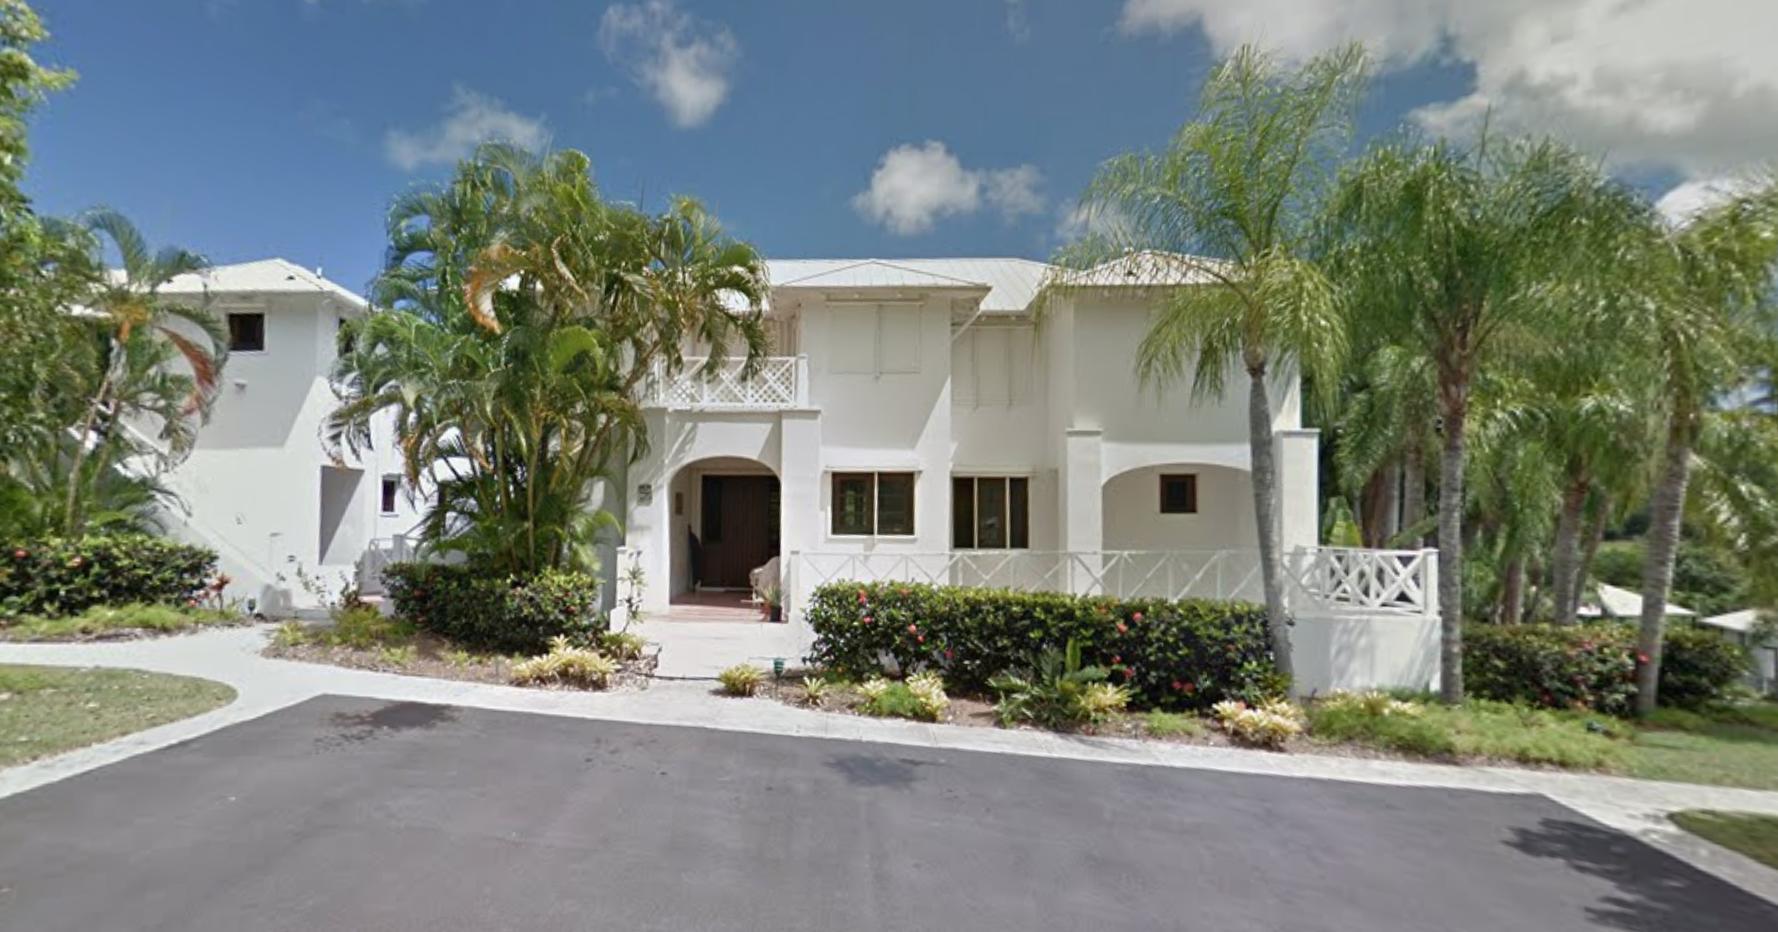 RE/MAX real estate, US Virgin Islands, River Estate, New Listing  Condo Rental  River PR